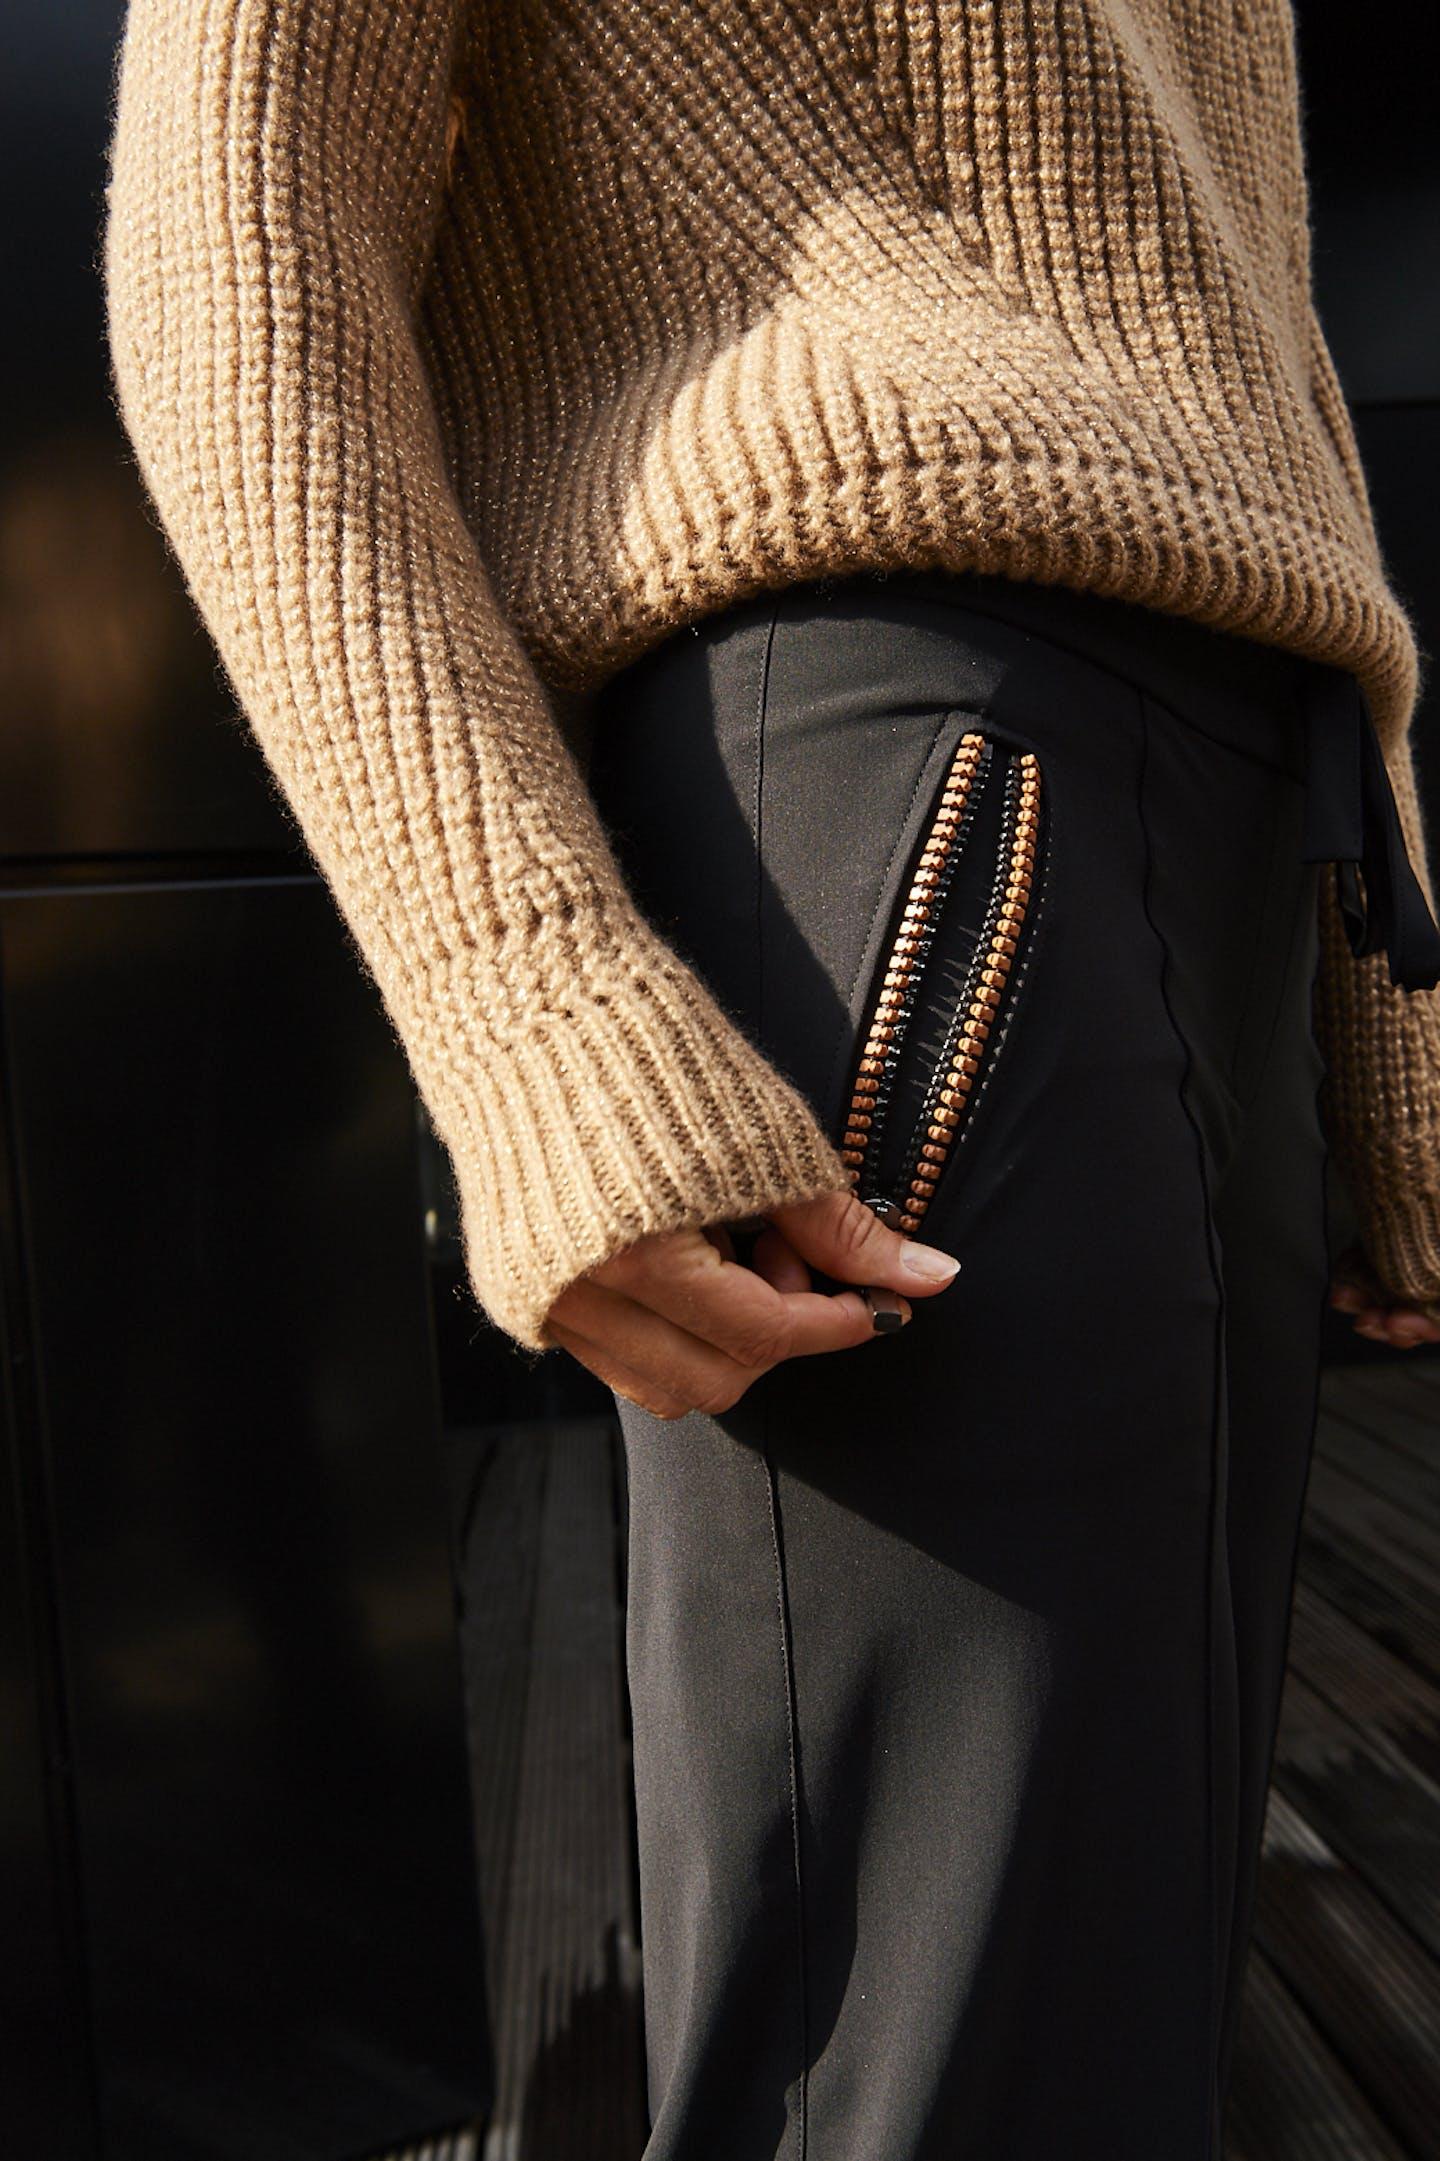 trouser - autum season